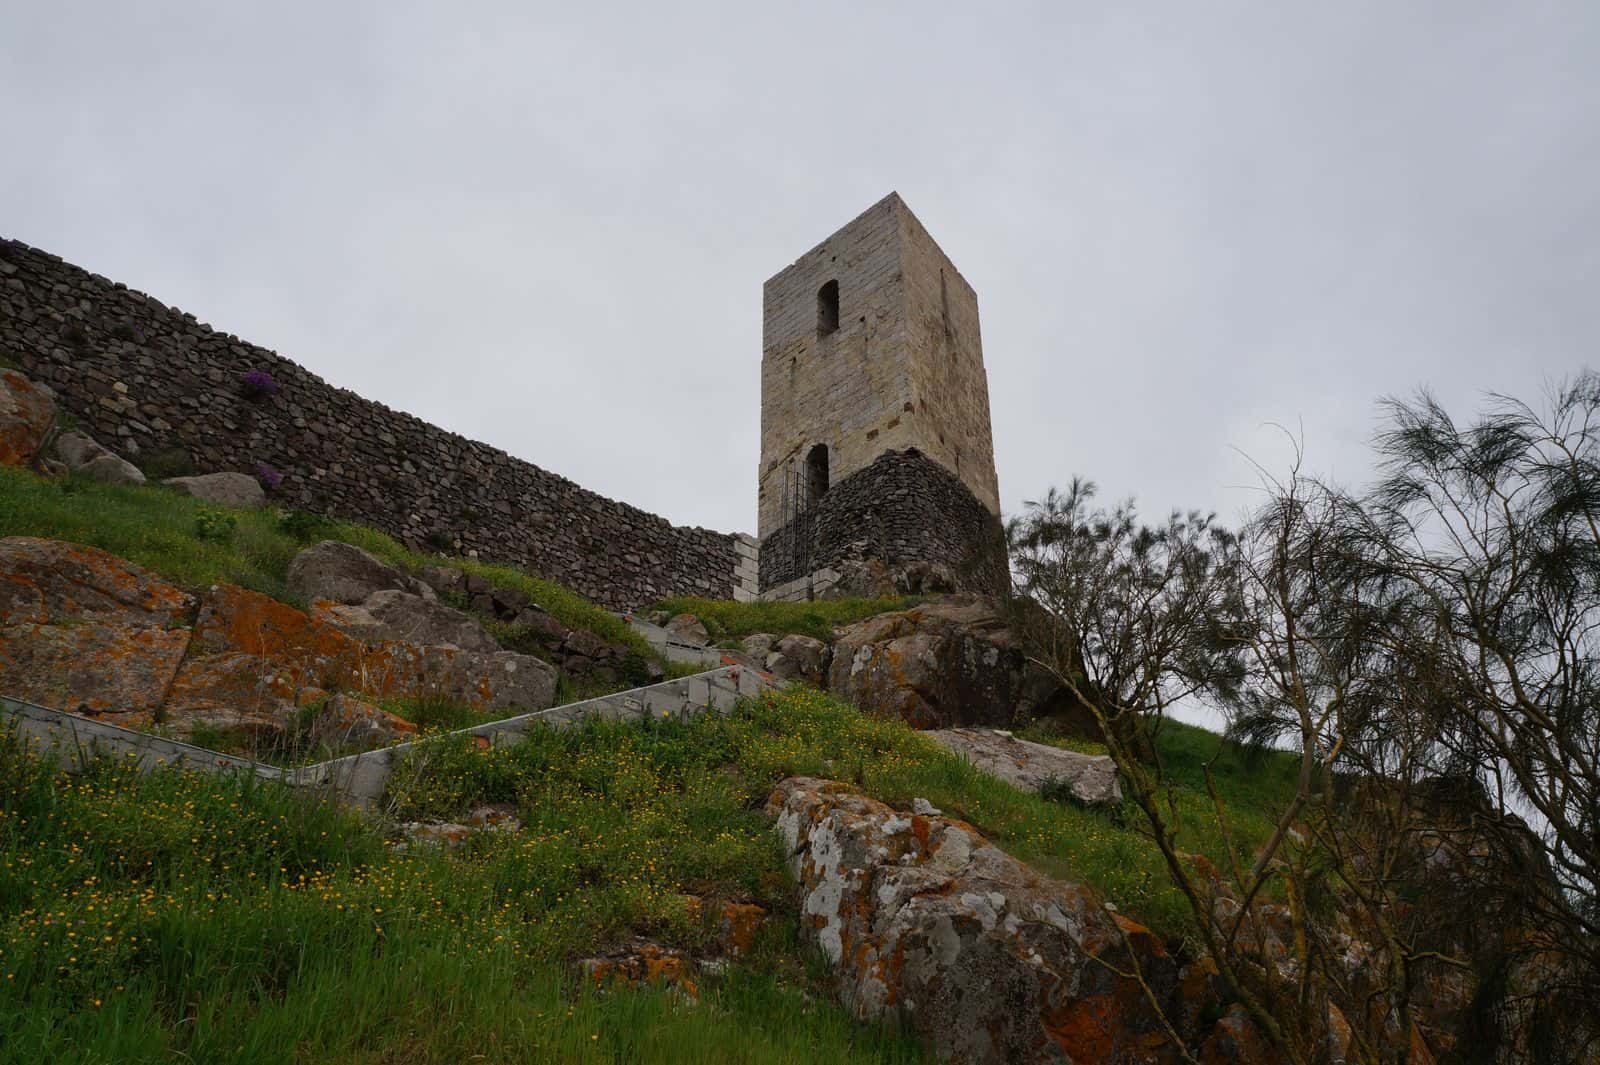 castello_medievale_osilo_malaspina_torre_quadrata